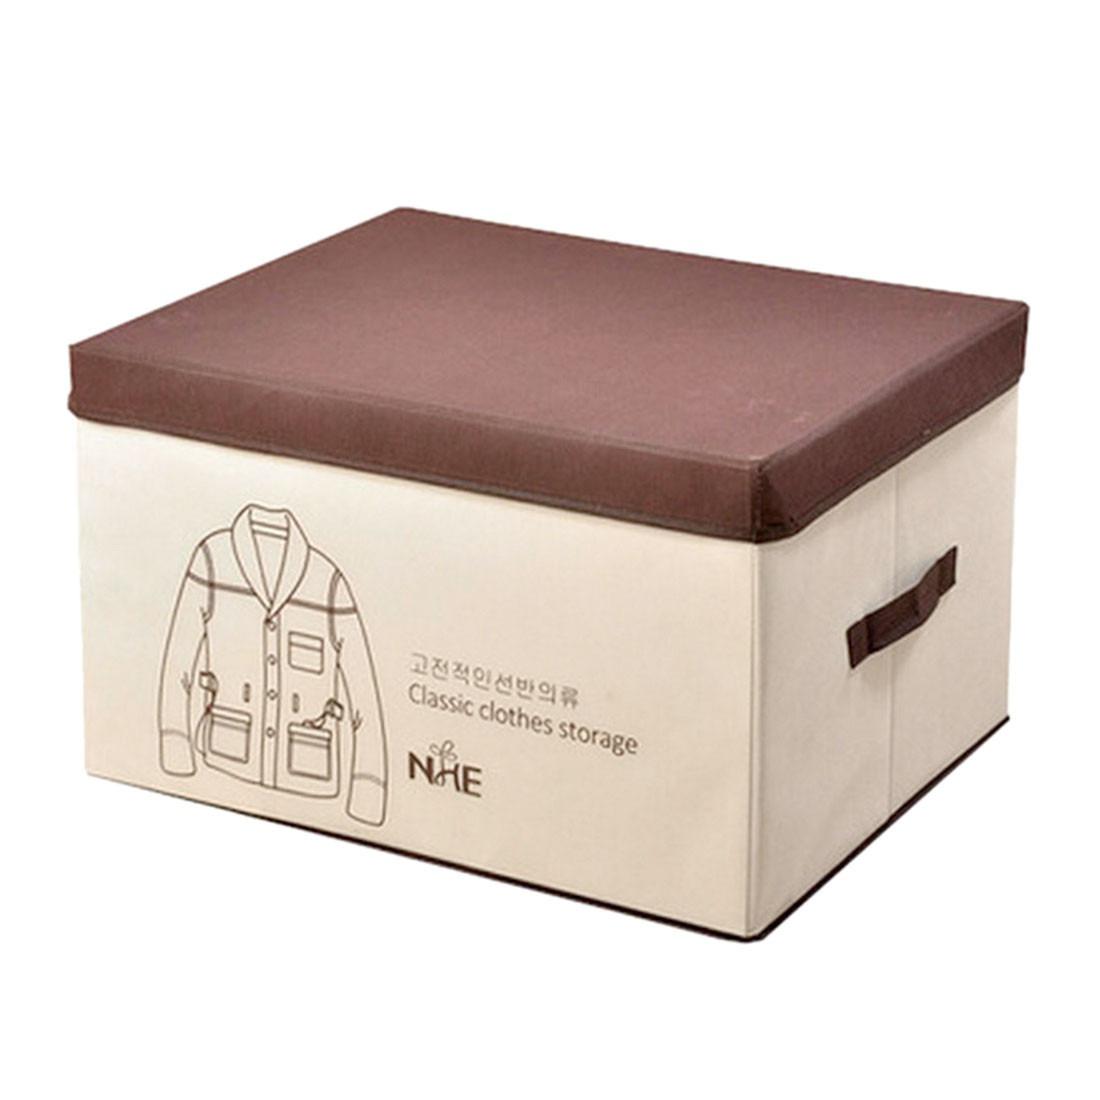 Classic Clothes Storage Box Lids Tote Organization